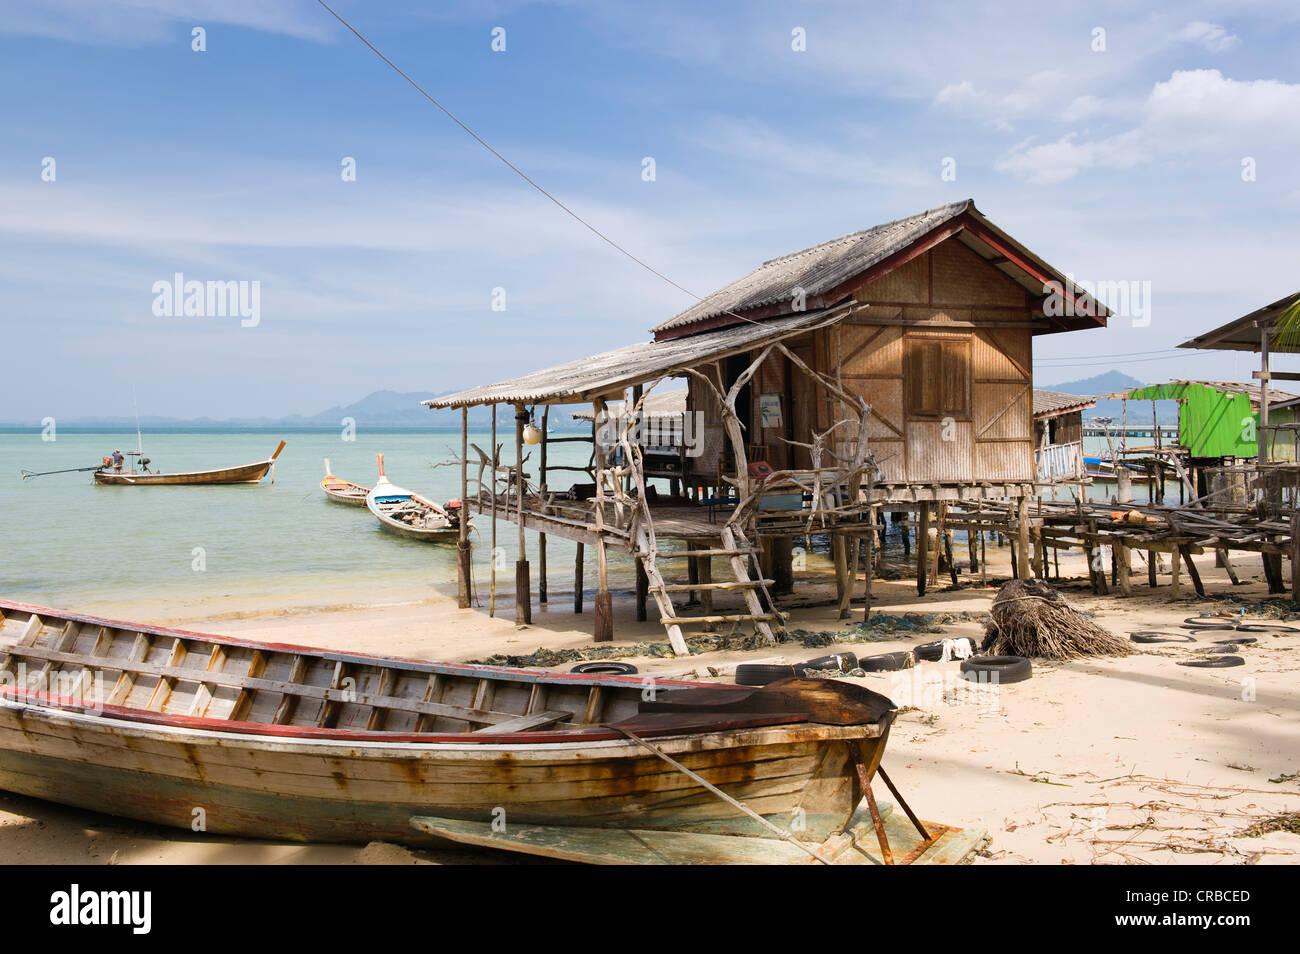 fishermans-house-on-stilts-long-tail-boat-fishing-village-ko-muk-or-CRBCED.jpg